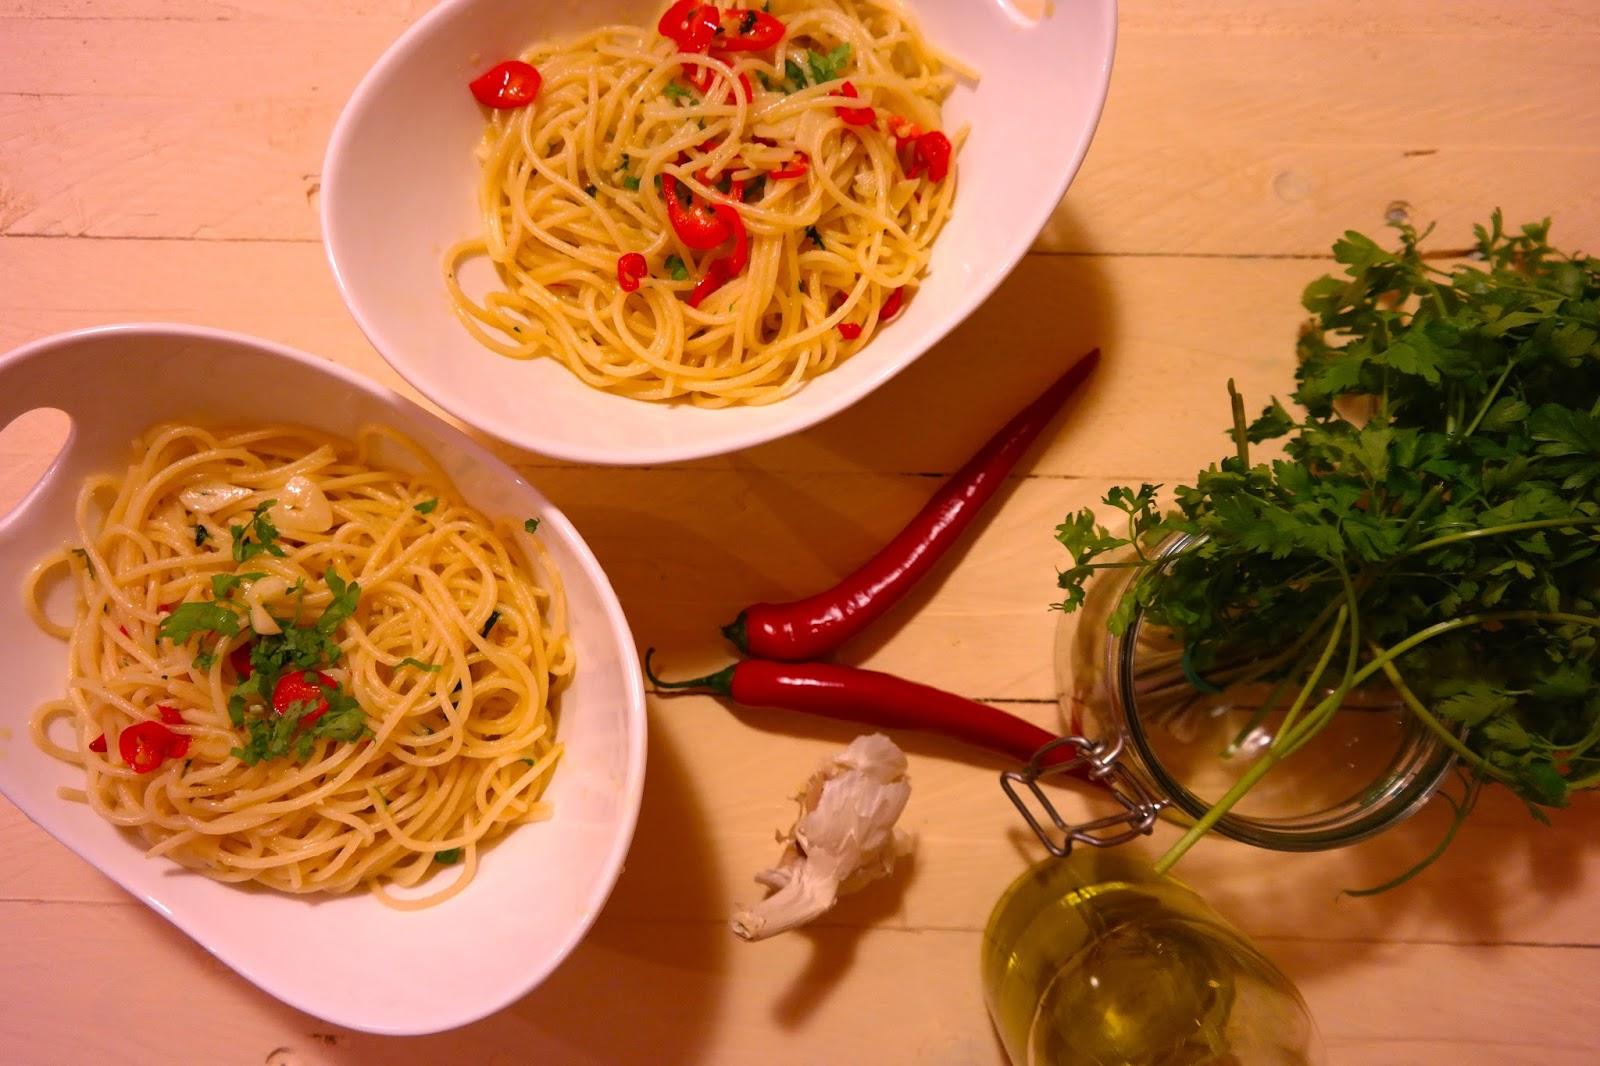 http://www.gitmallina.pl/2015/01/spaghetti-aglio-olio-e-peperoncino.html